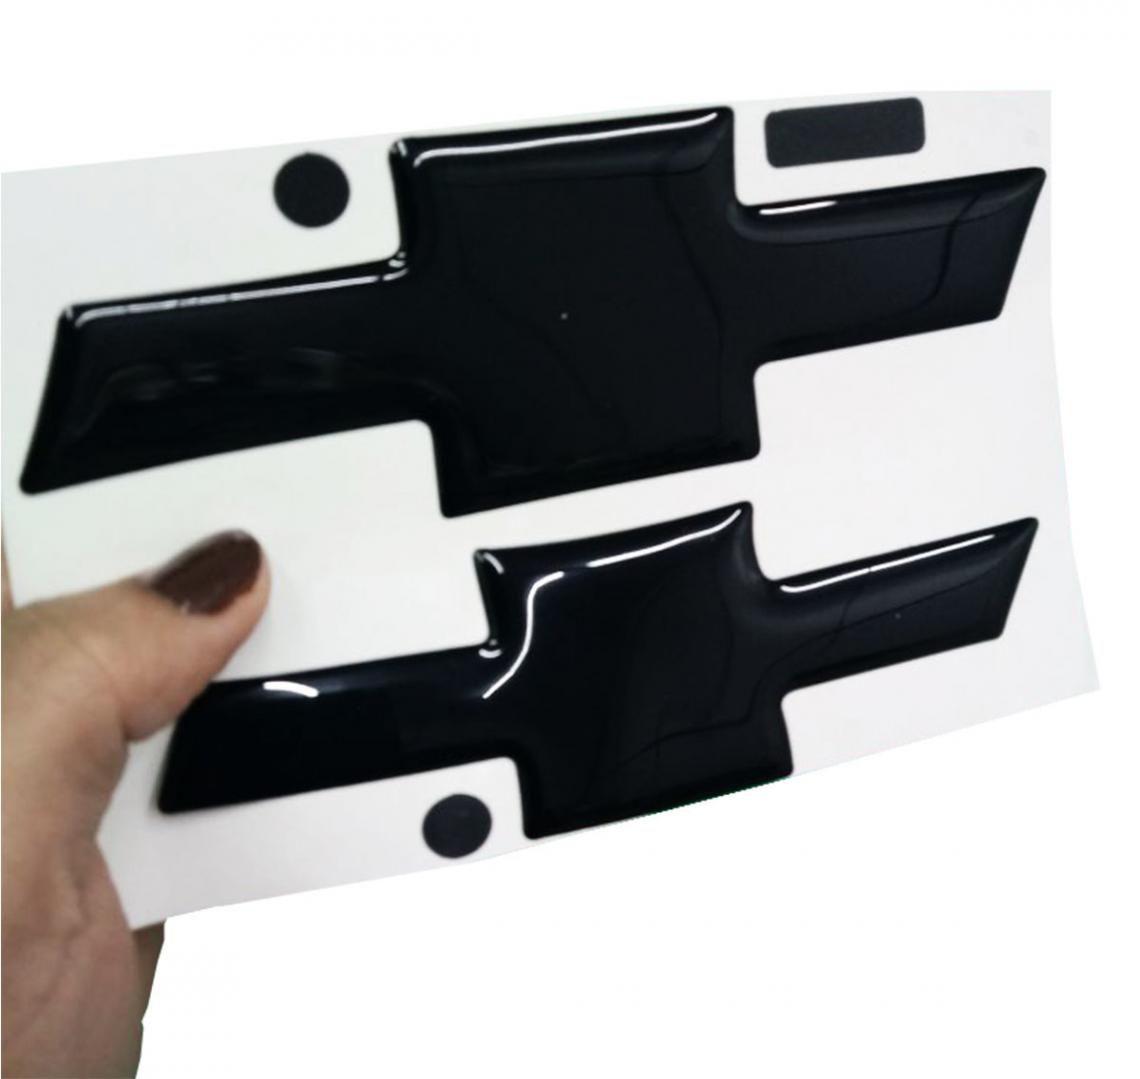 Gravata Adesiva Resinada Cobalt até 2016 Black Piano